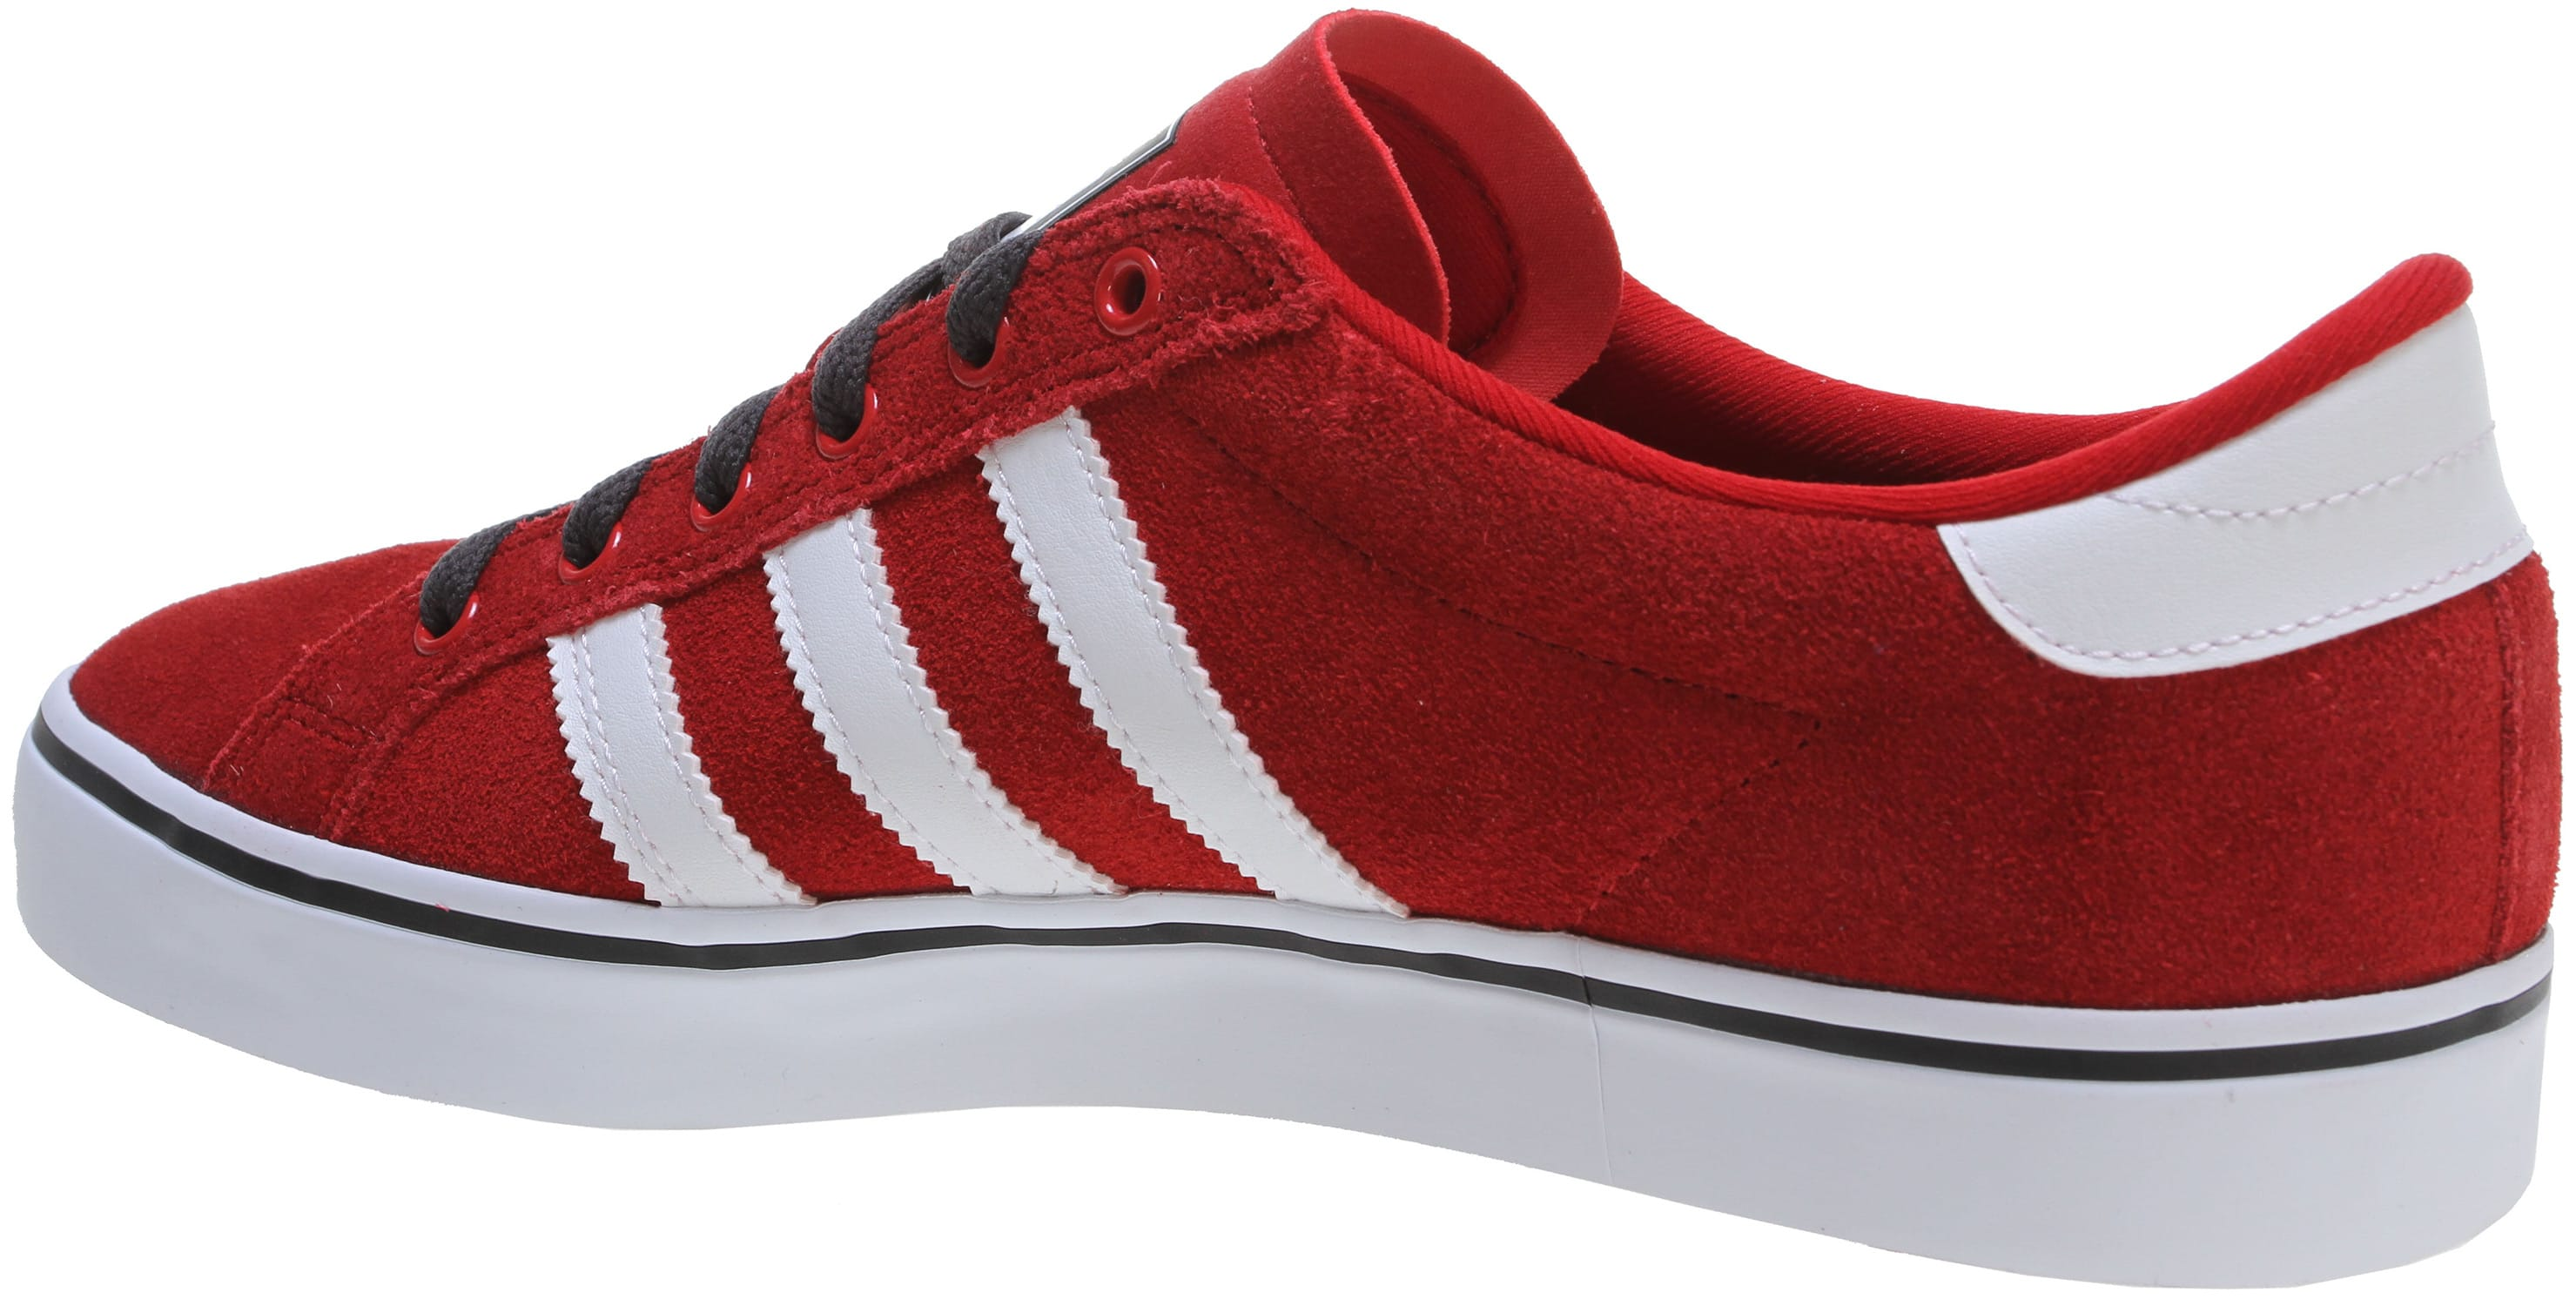 wholesale dealer 7fe30 cac59 Adidas Americana Low Skate Shoes - thumbnail 3